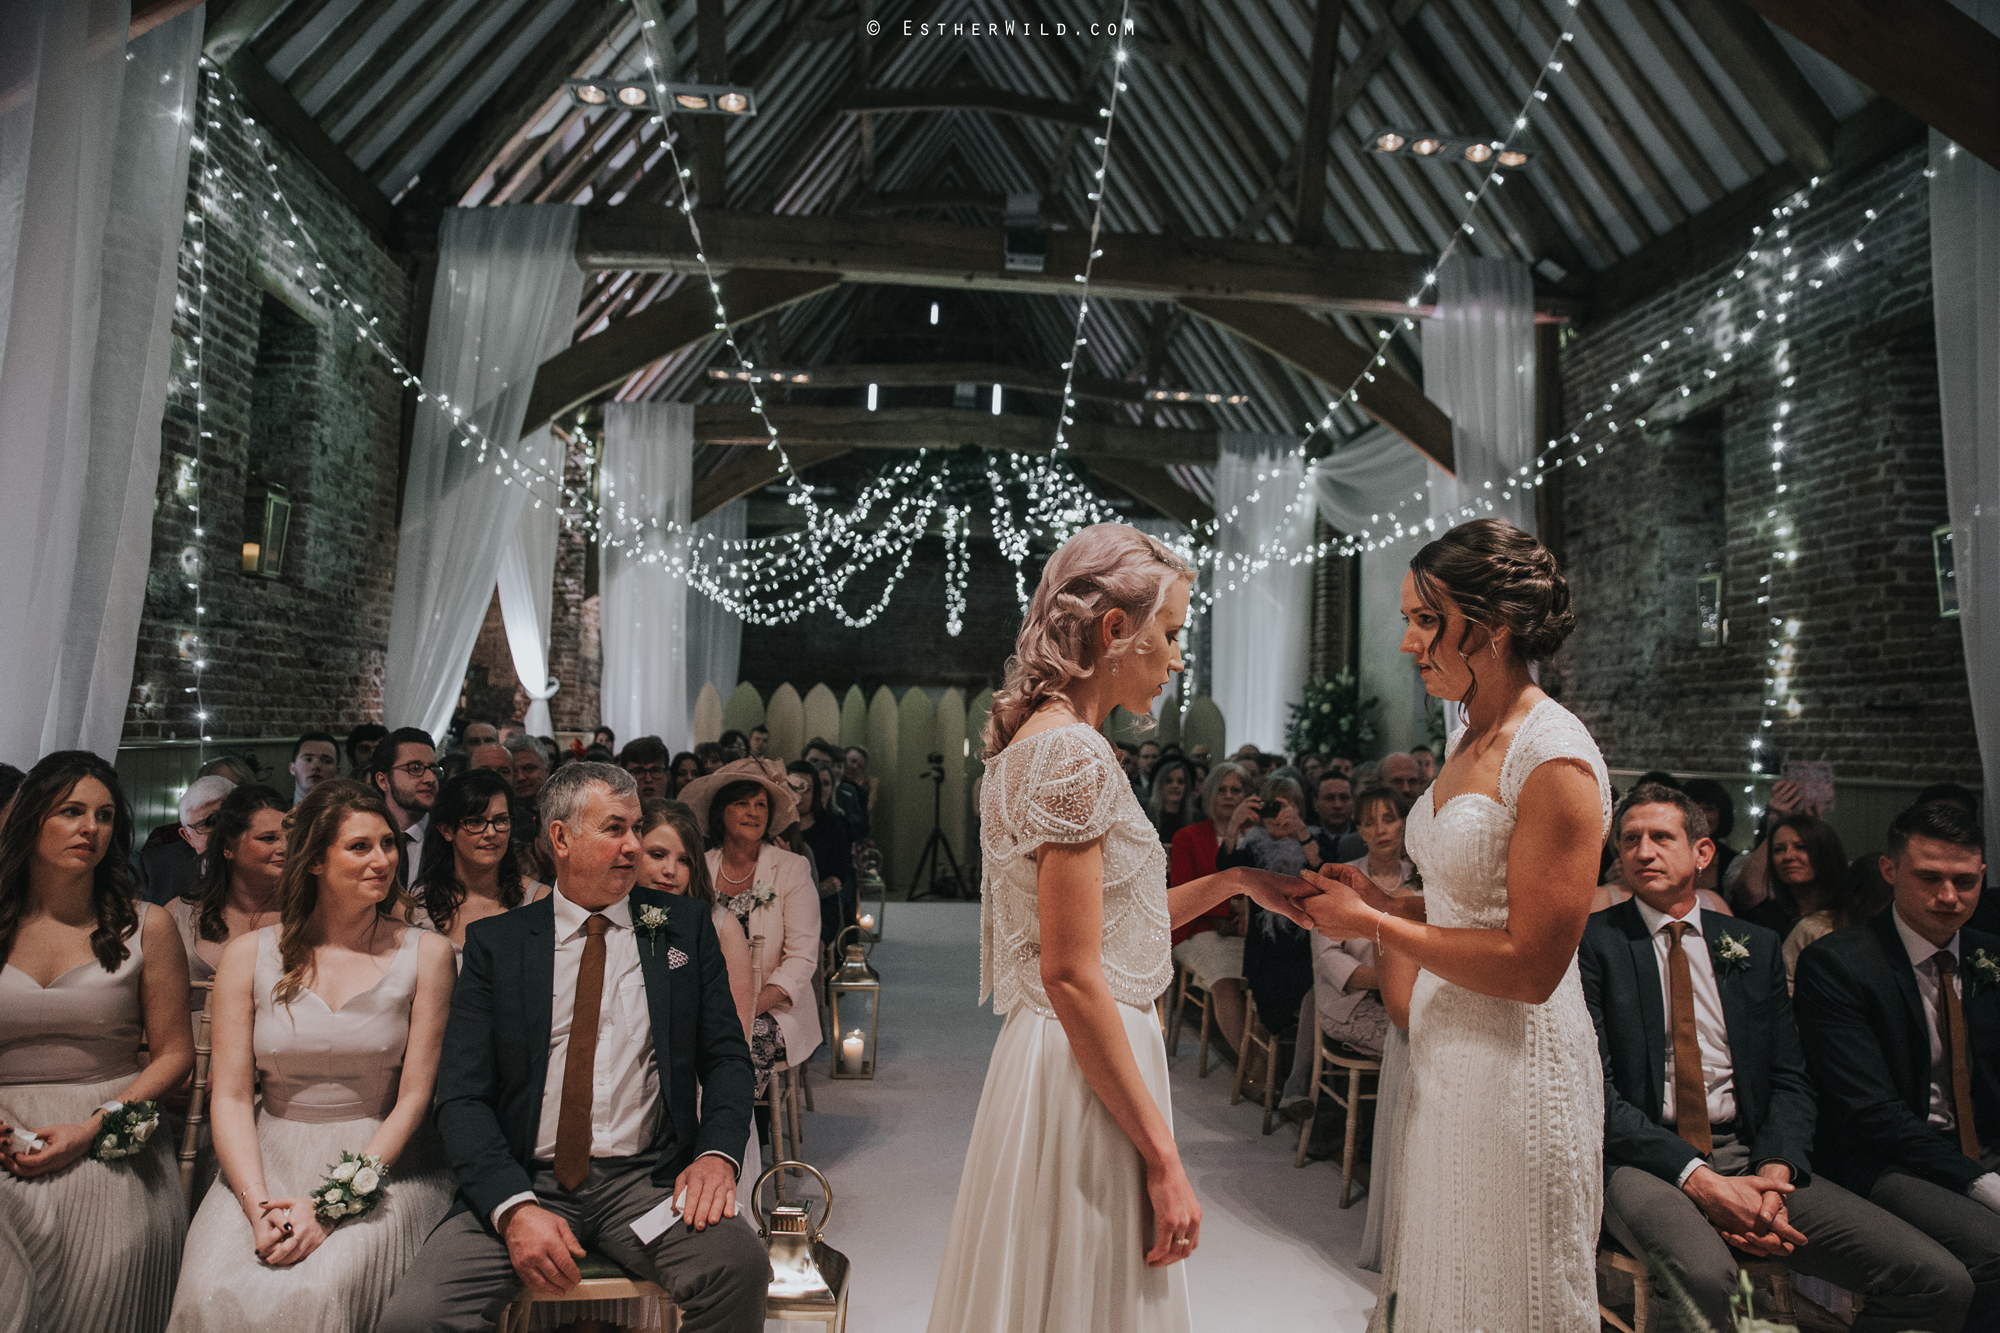 Elms_Barn_Weddings_Suffolk_Photographer_Copyright_Esther_Wild_IMG_1242.jpg